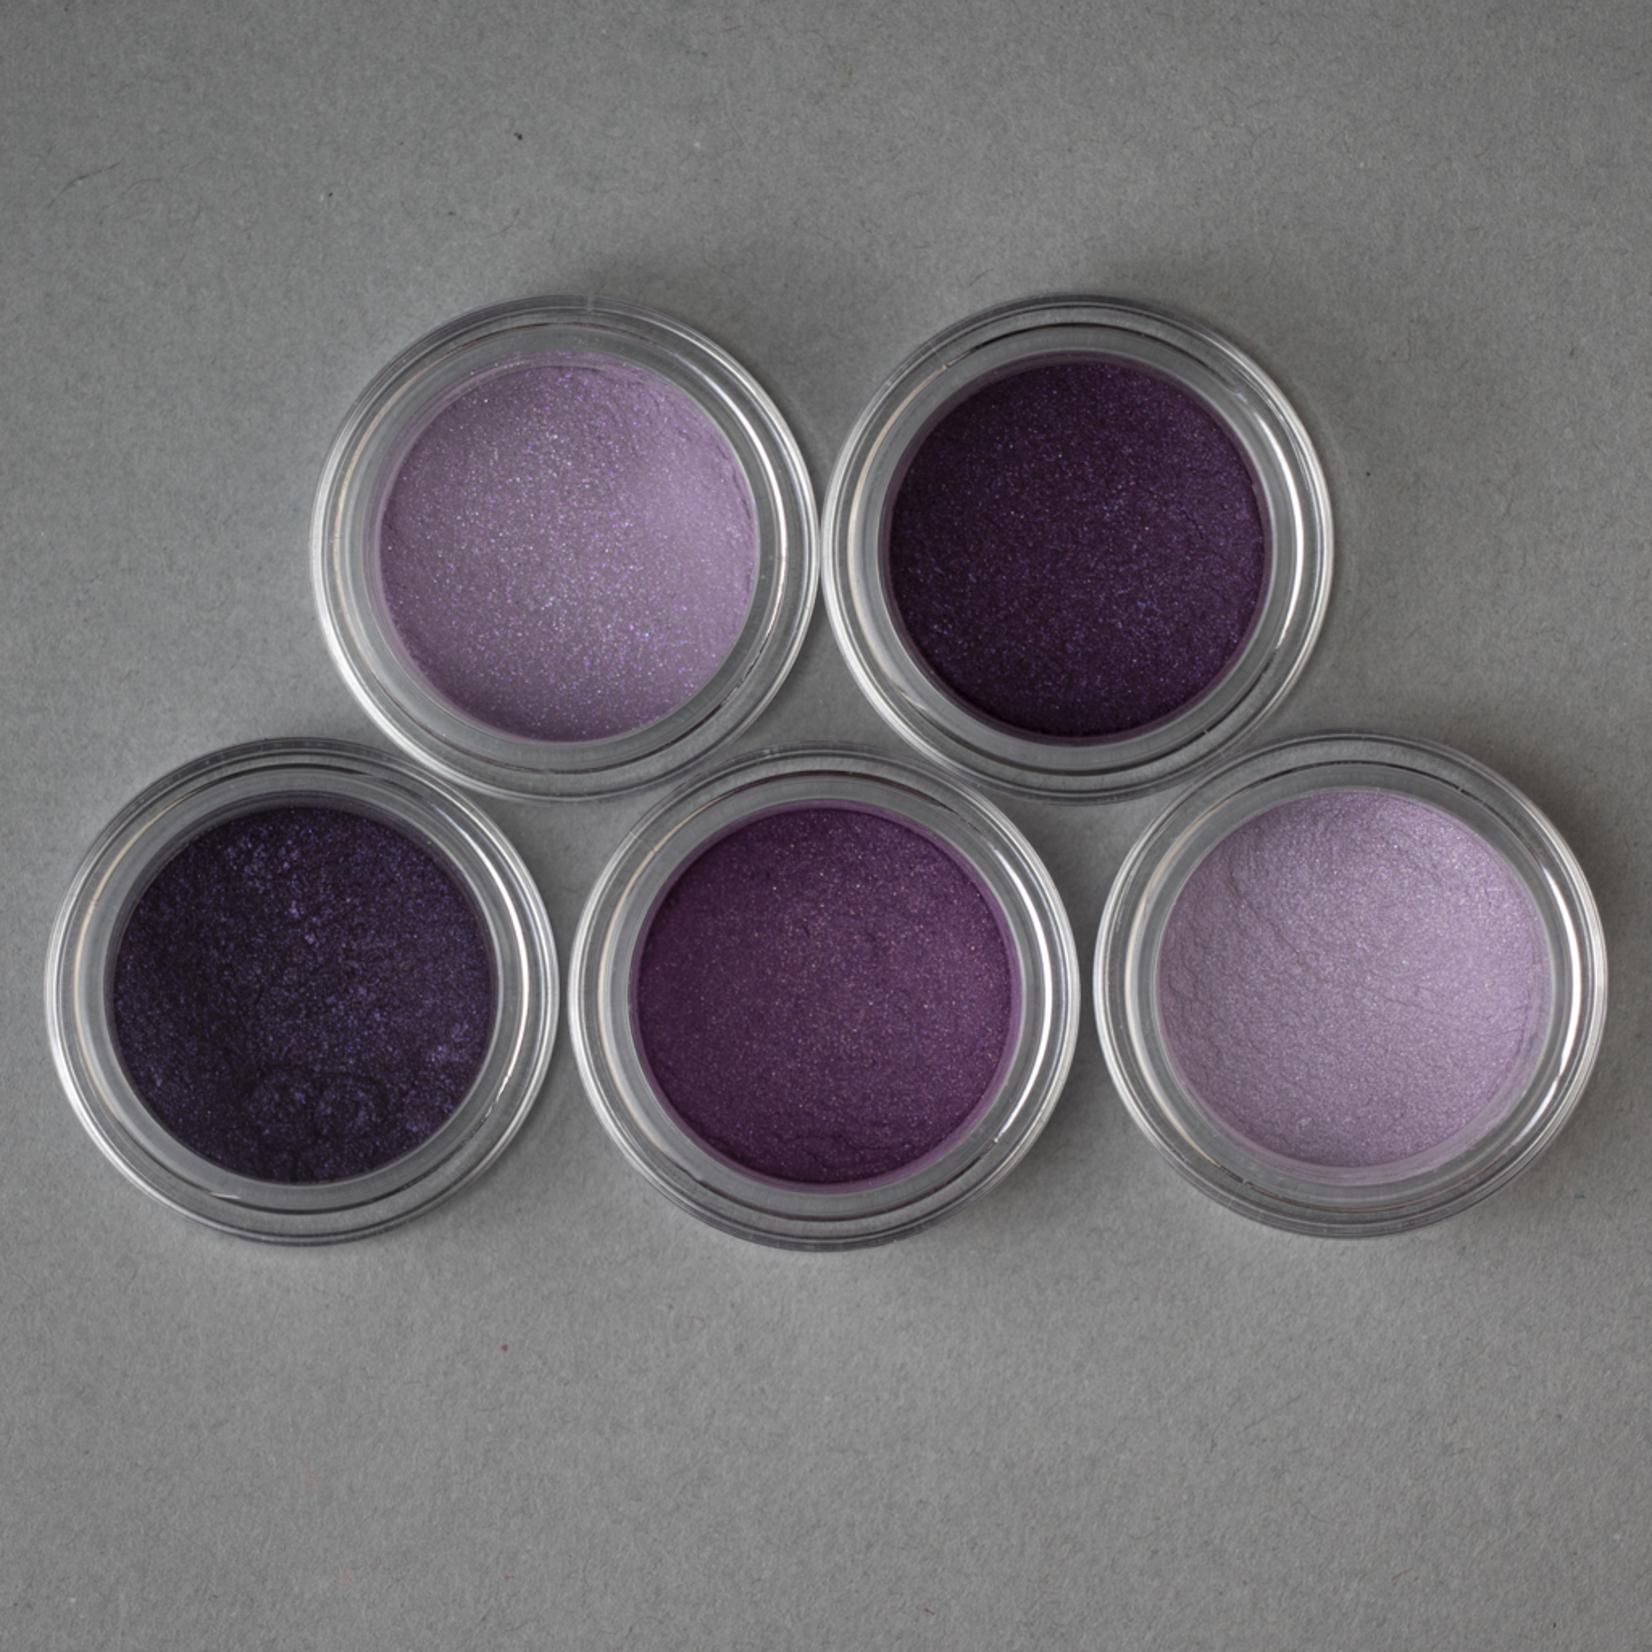 C12 Luxurious Lavender